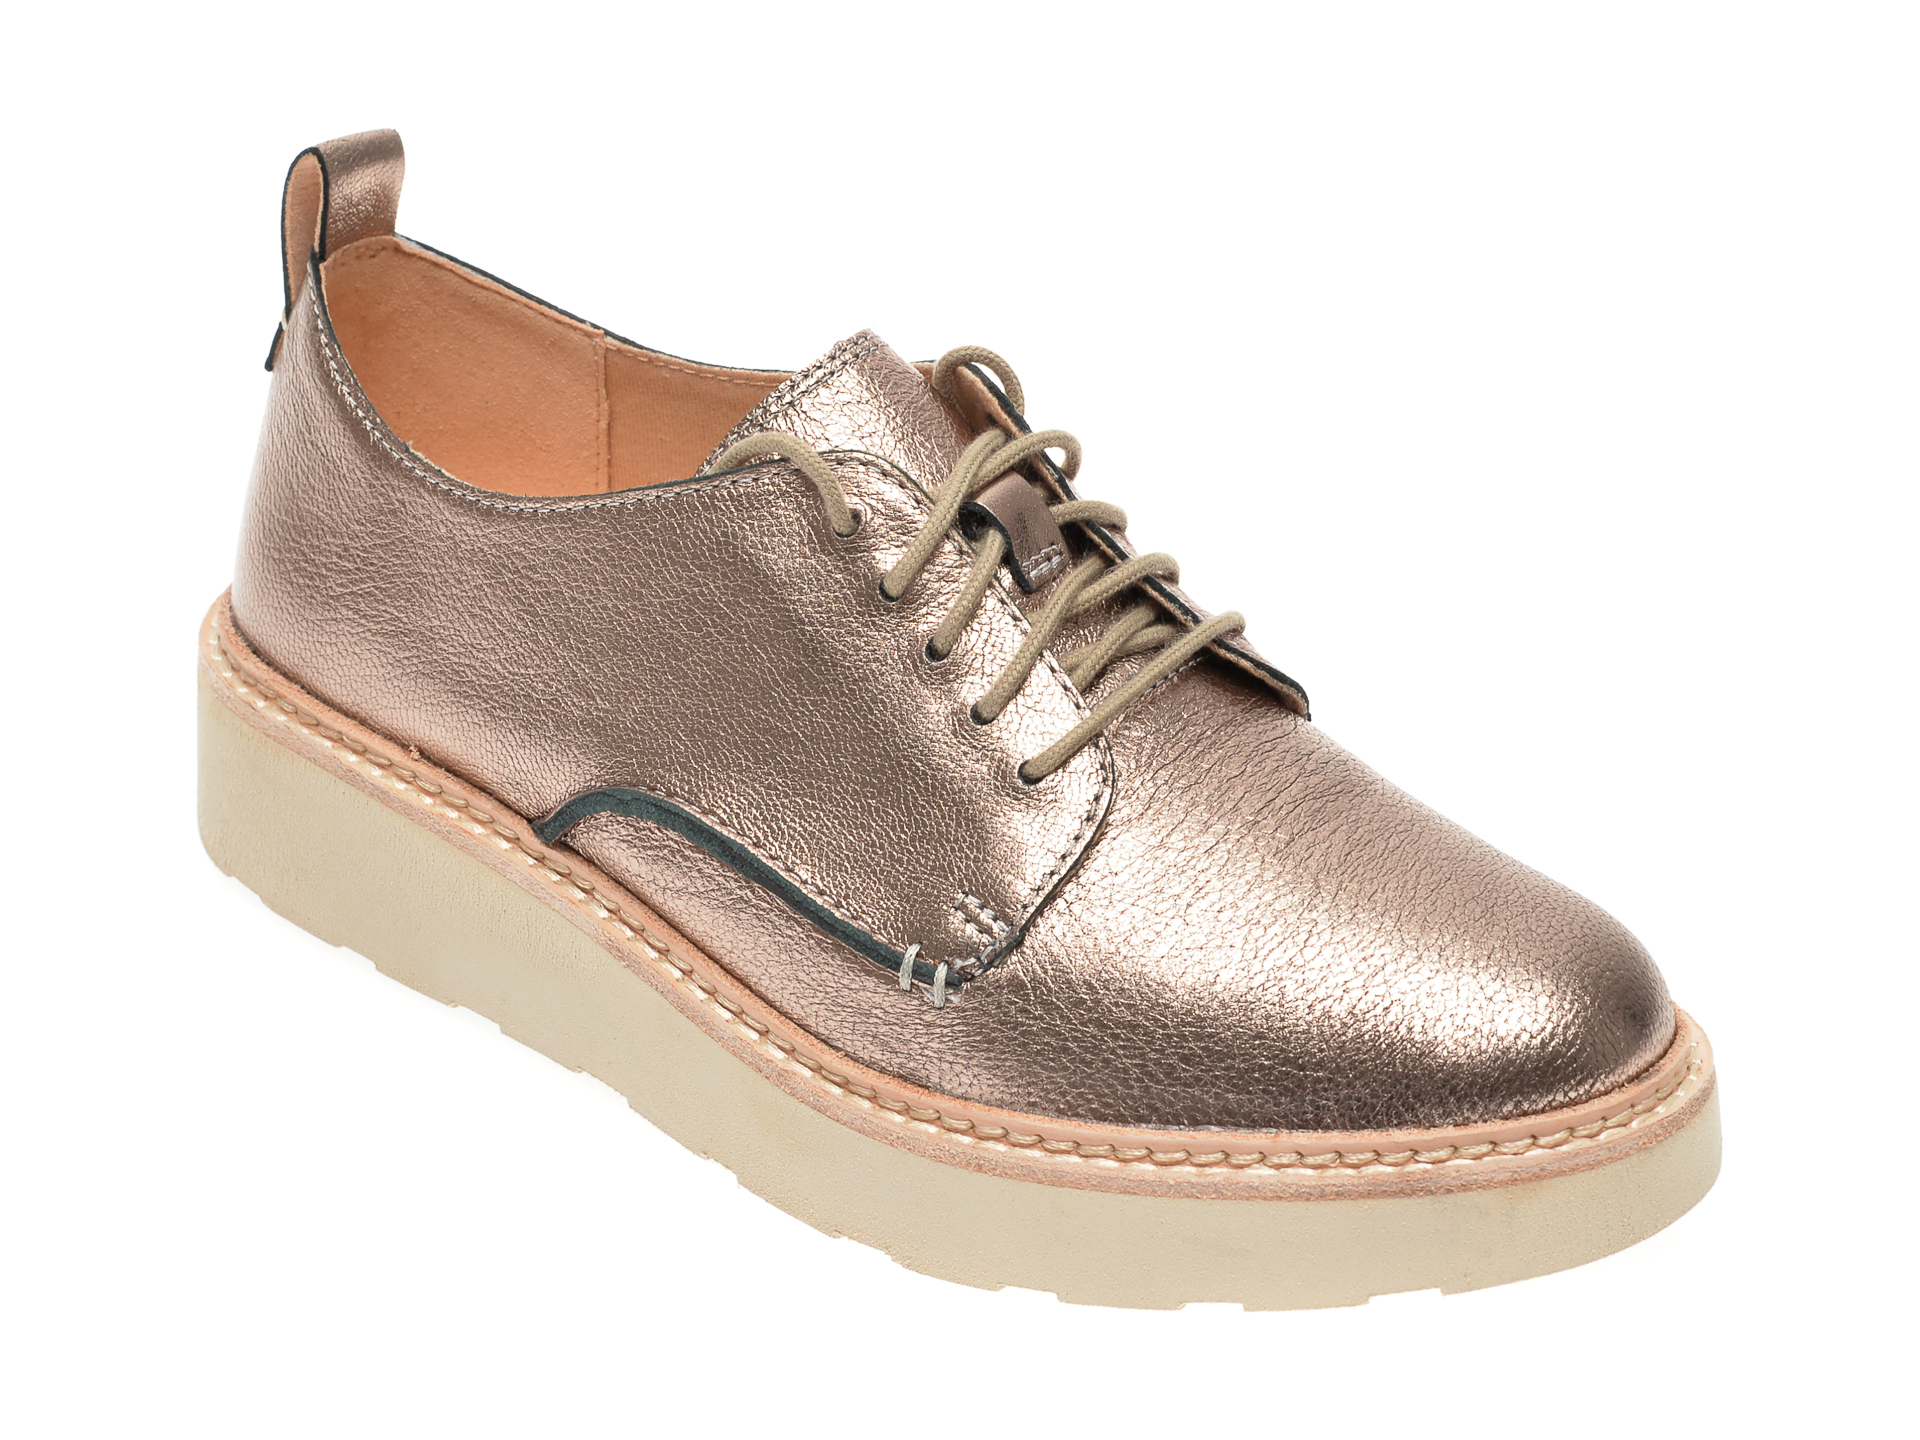 Pantofi CLARKS aurii, Kaylin Cara, din piele naturala